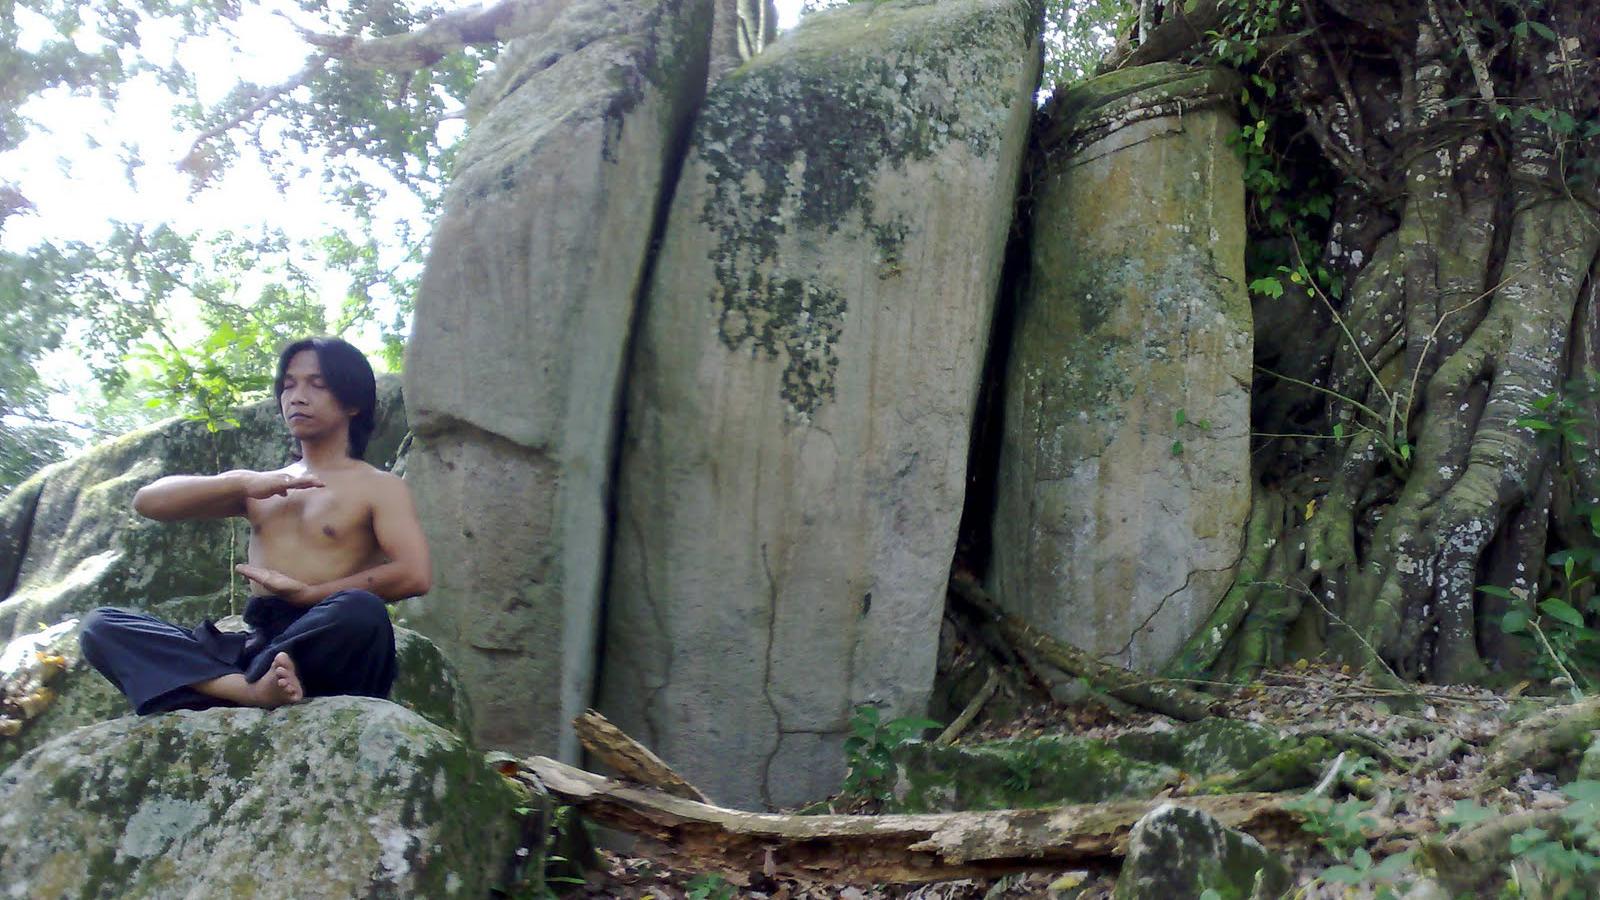 pendaki gunung himalaya pertama pendaki gunung ijen pendaki gunung in english pendaki gunung indonesia pendaki gunung indonesia yang terkenal pendaki gunung info pendaki gunung istilah pendaki gunung itu romantis pendaki gunung jalan mundur pendaki gunung jatuh